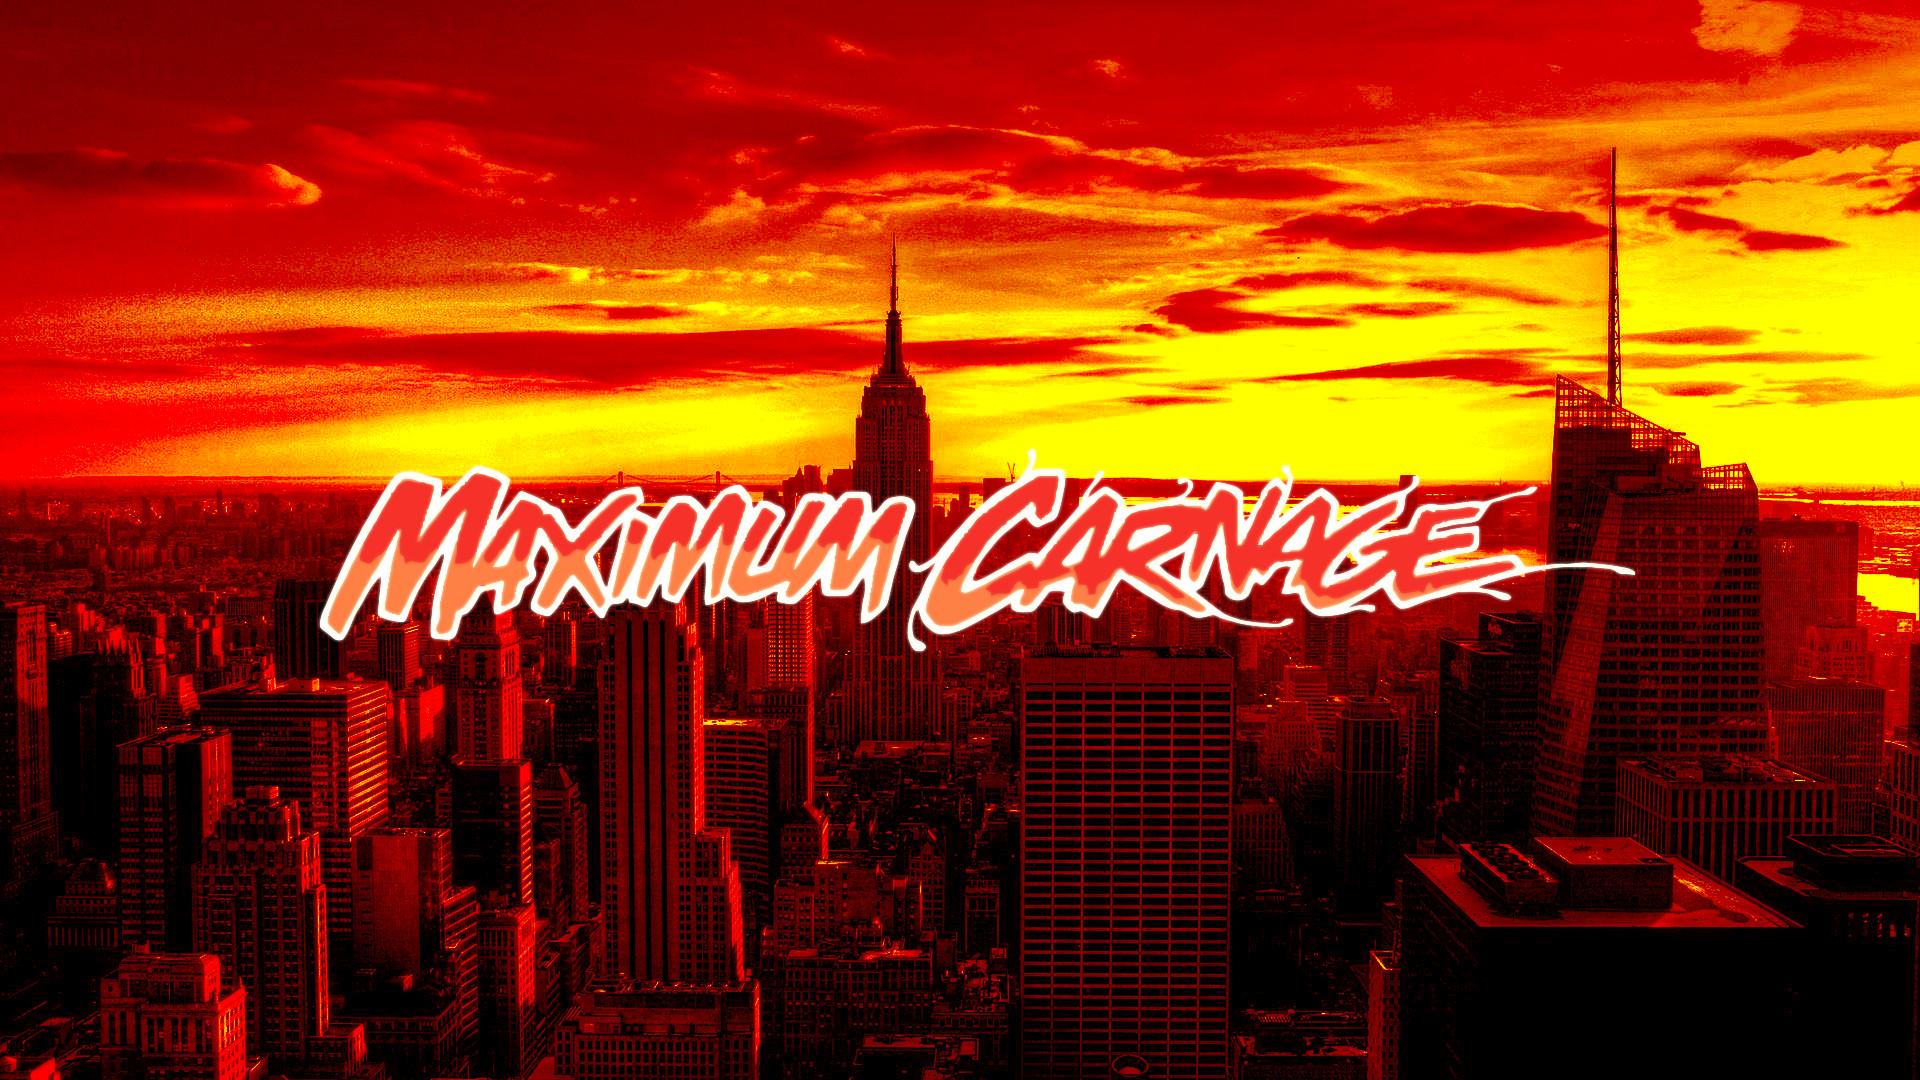 Maximum Carnage Wallpaper Hd Maximum carnage cover (no